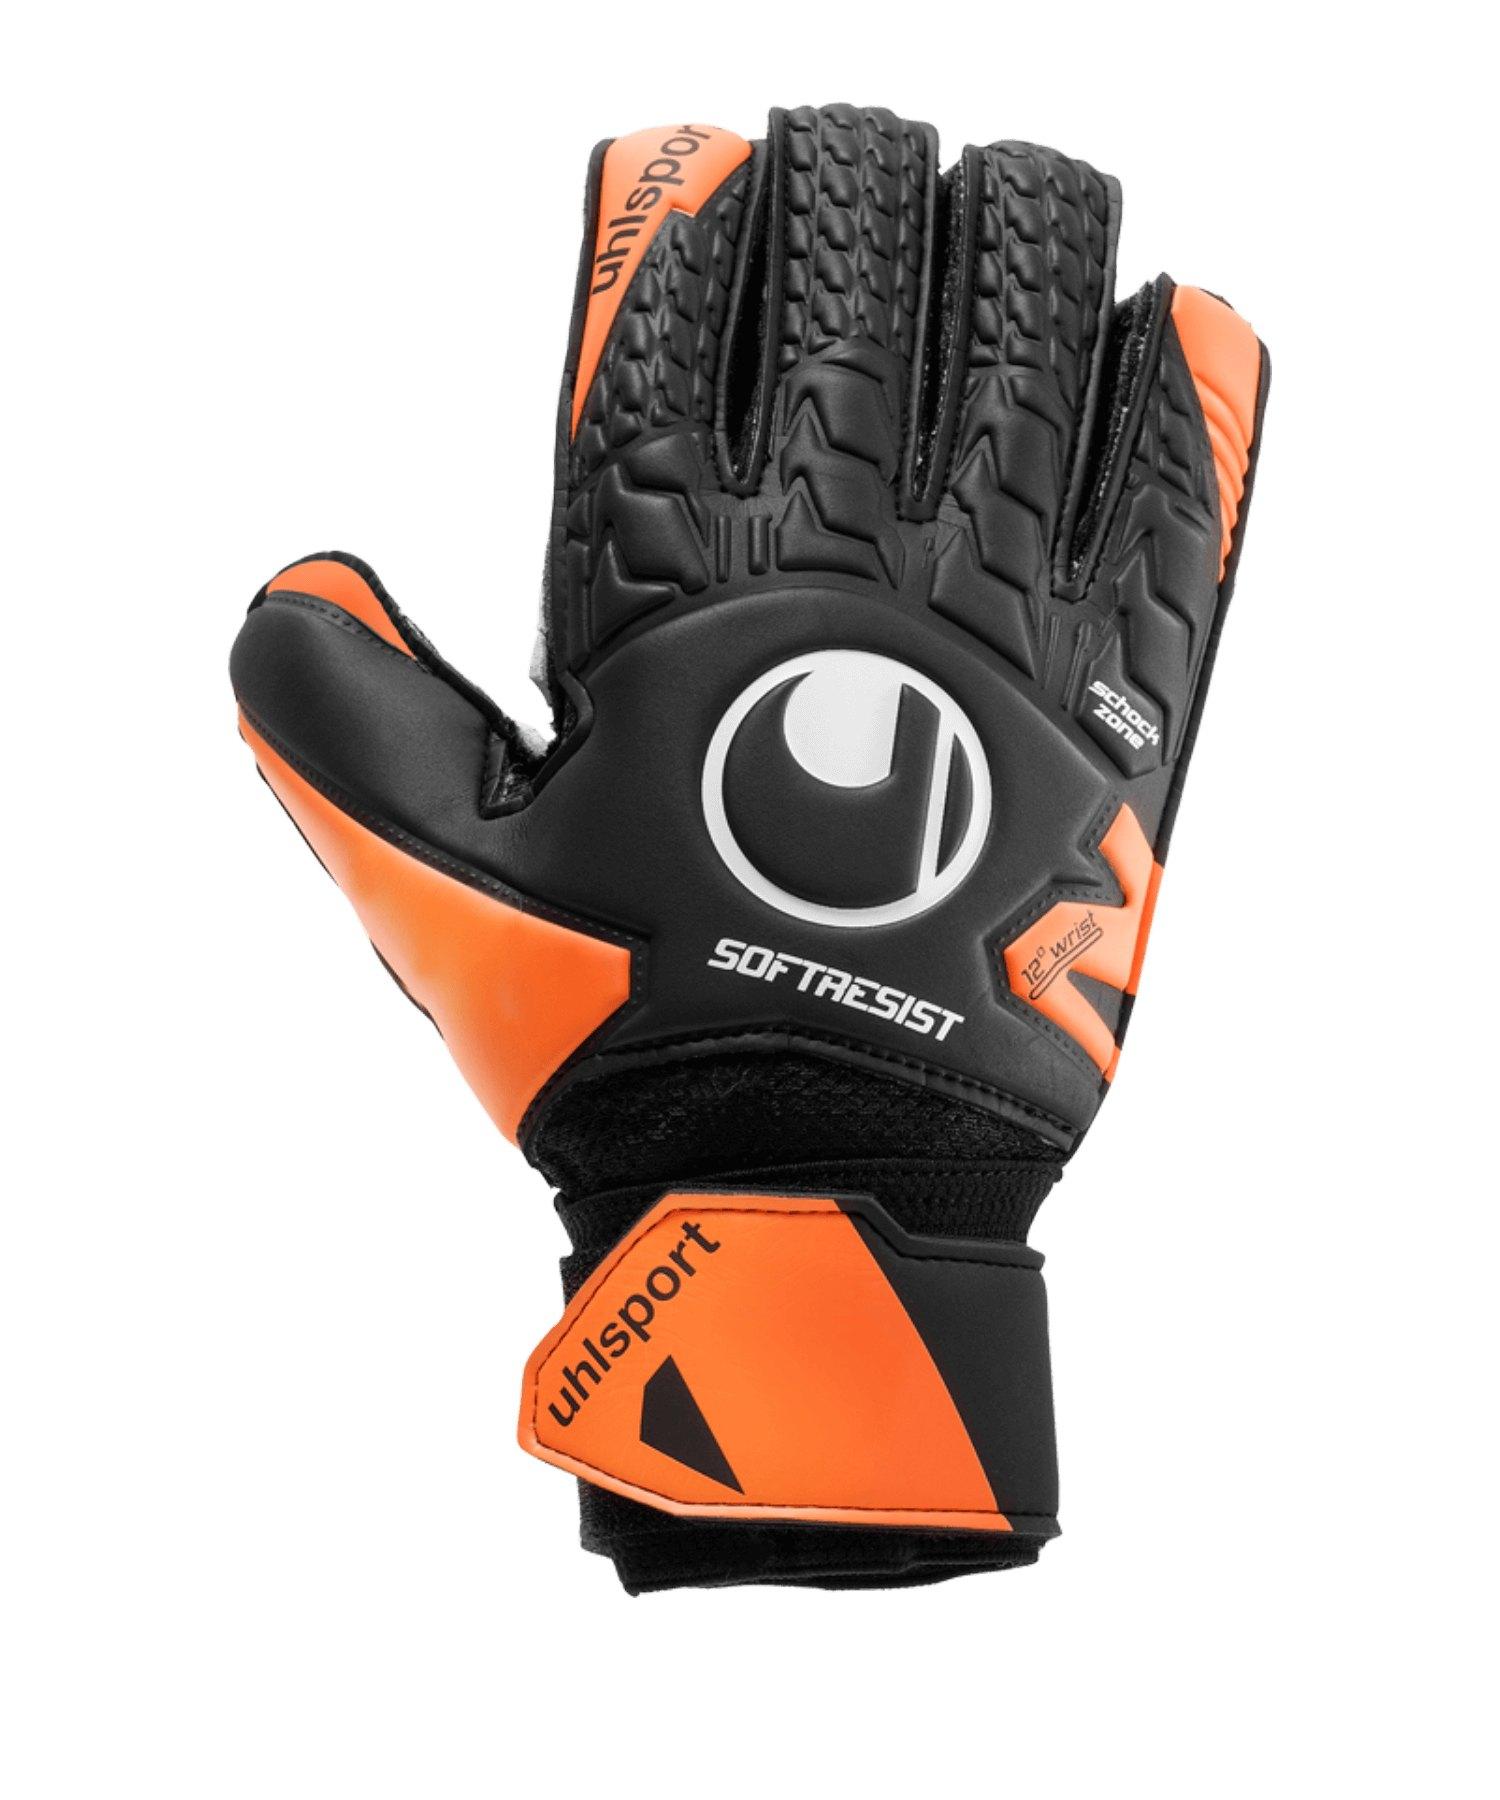 Uhlsport Soft Resist Flex Frame TW-Handschuh F01 - schwarz